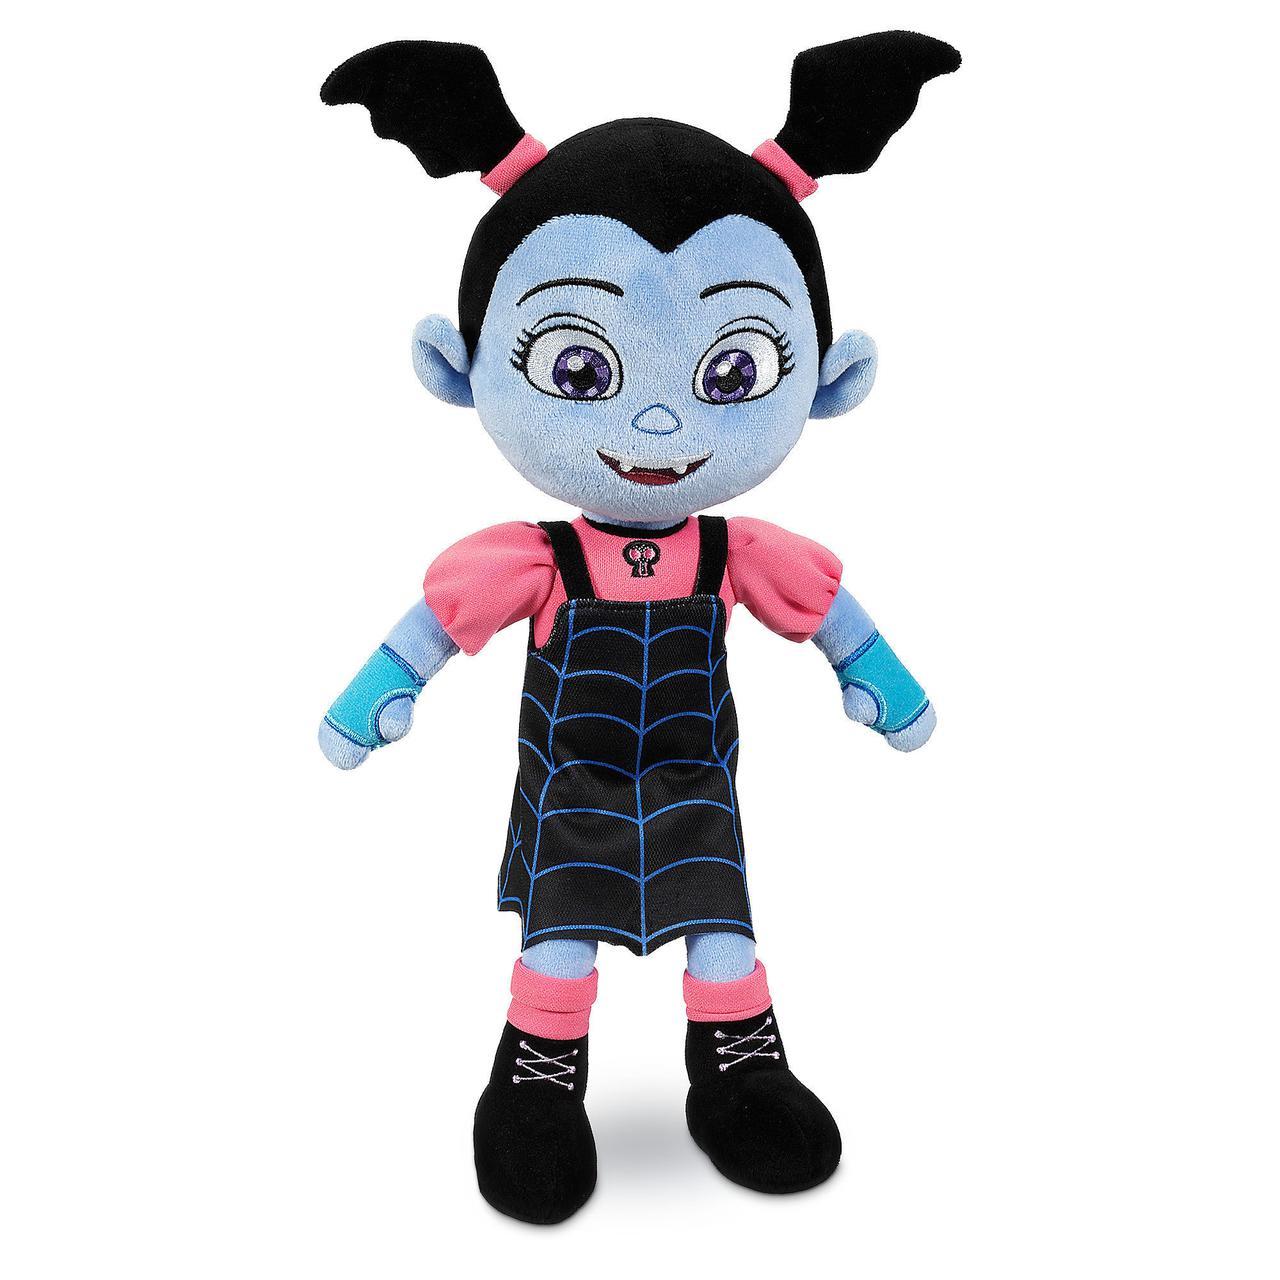 Disney Мягкая игрушка плюшевая кукла Вампирина 34см